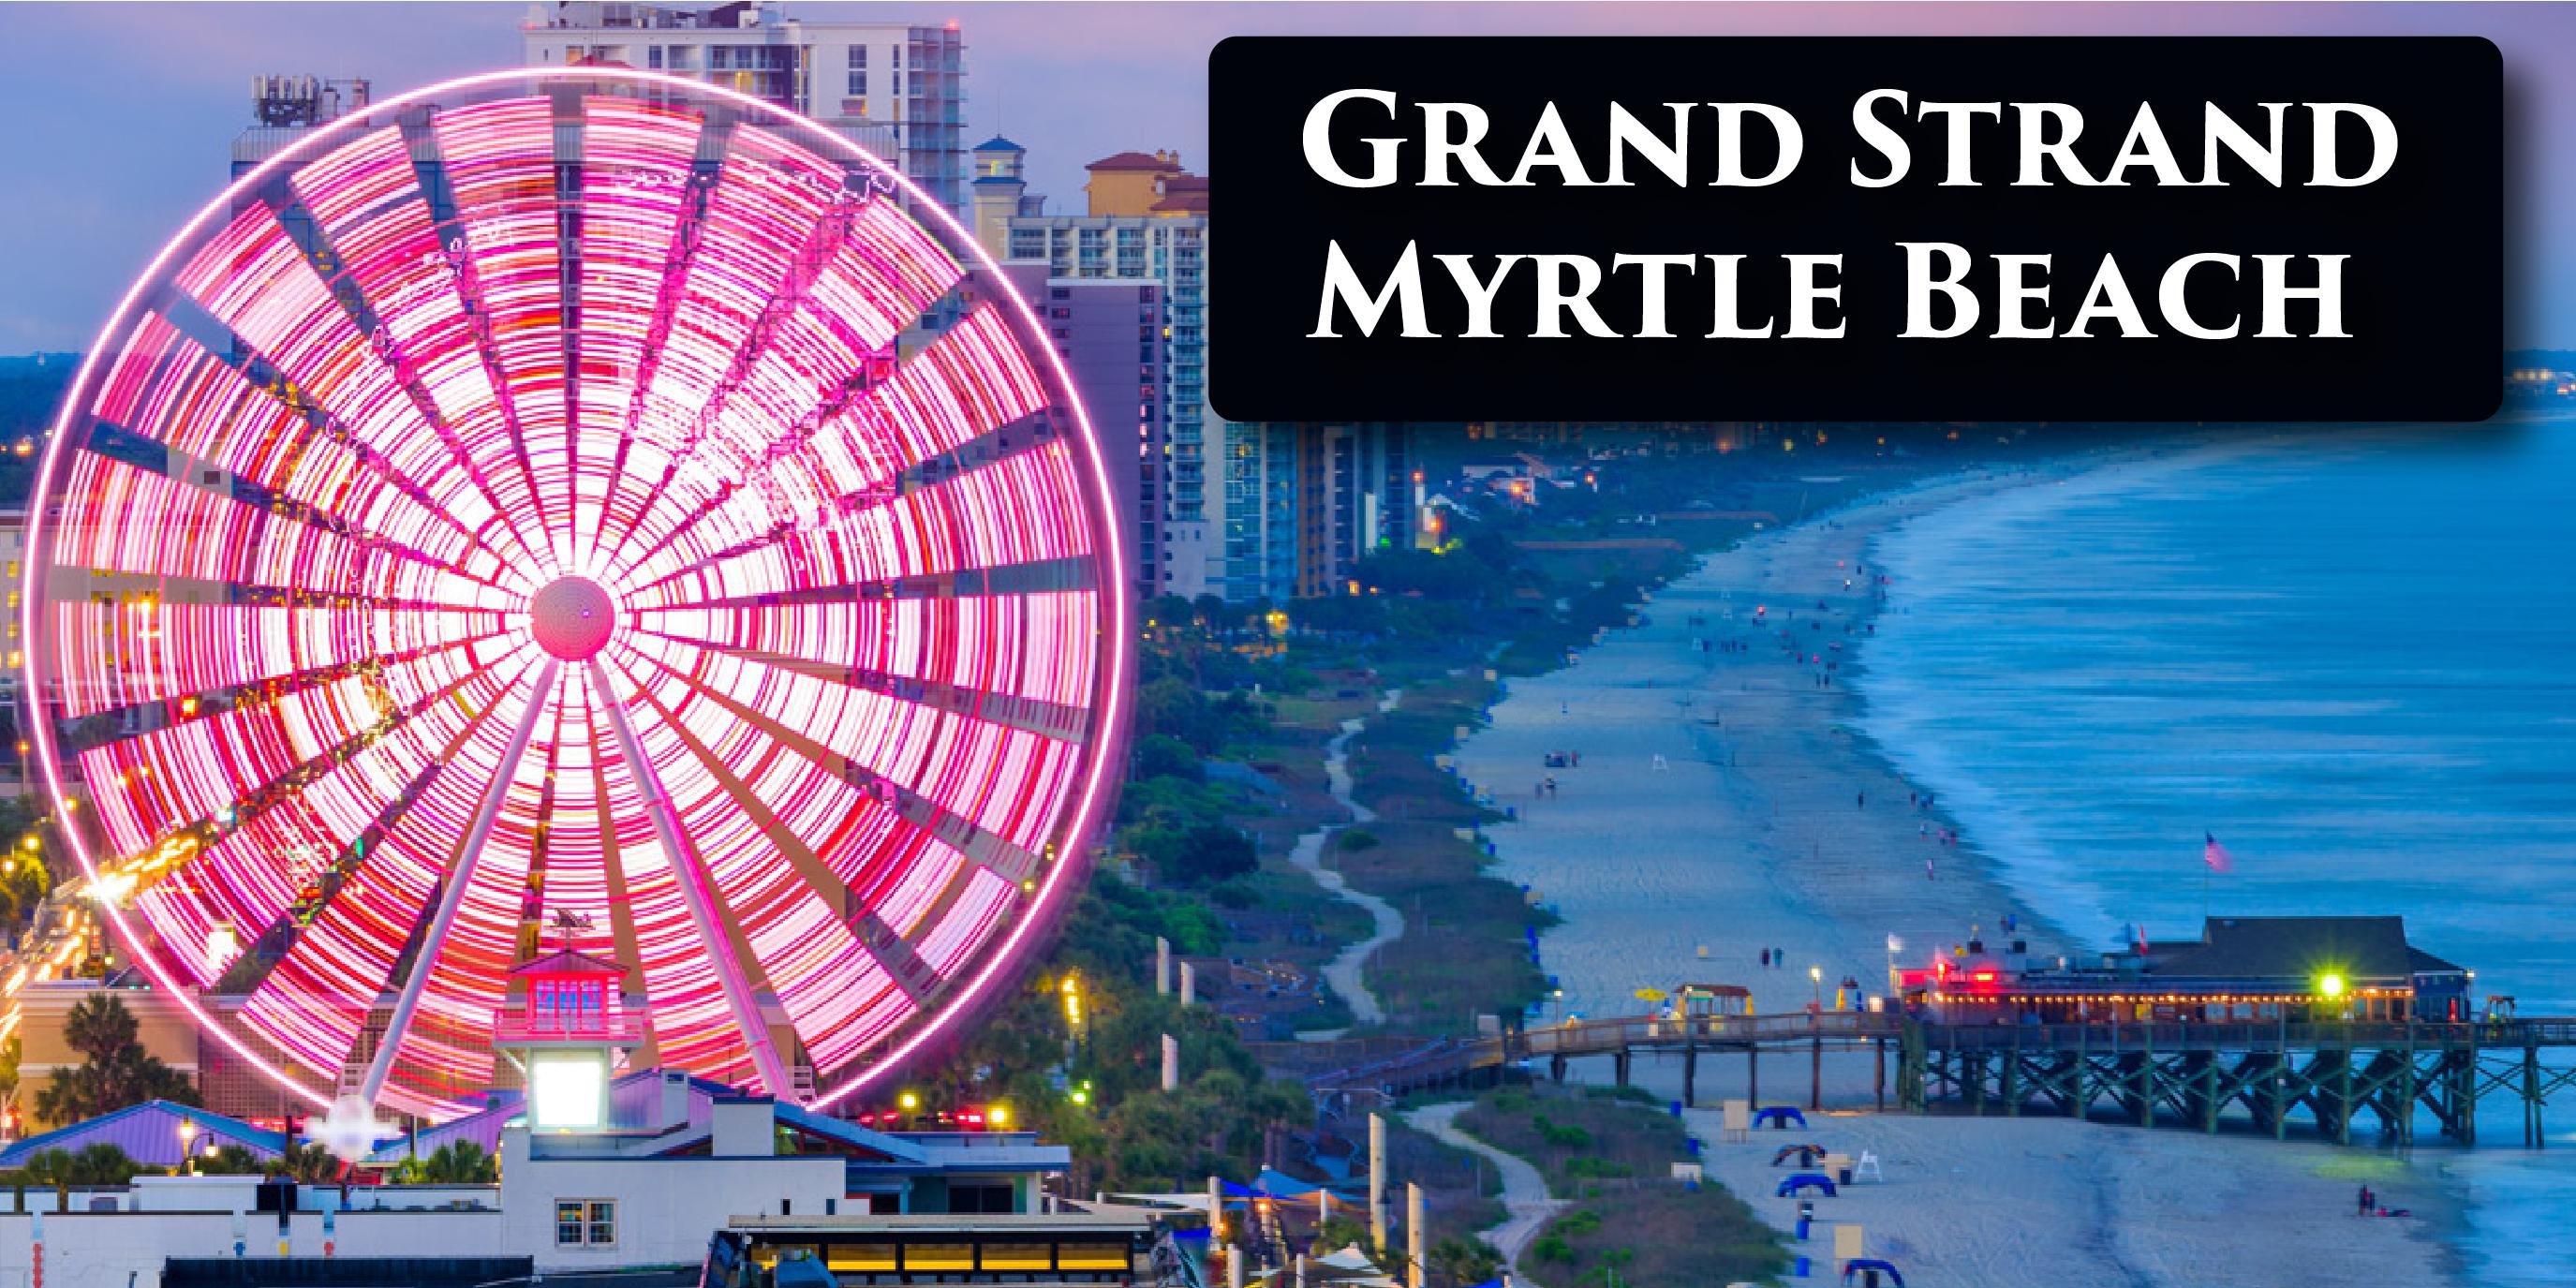 Grand Strand Myrtle Beach